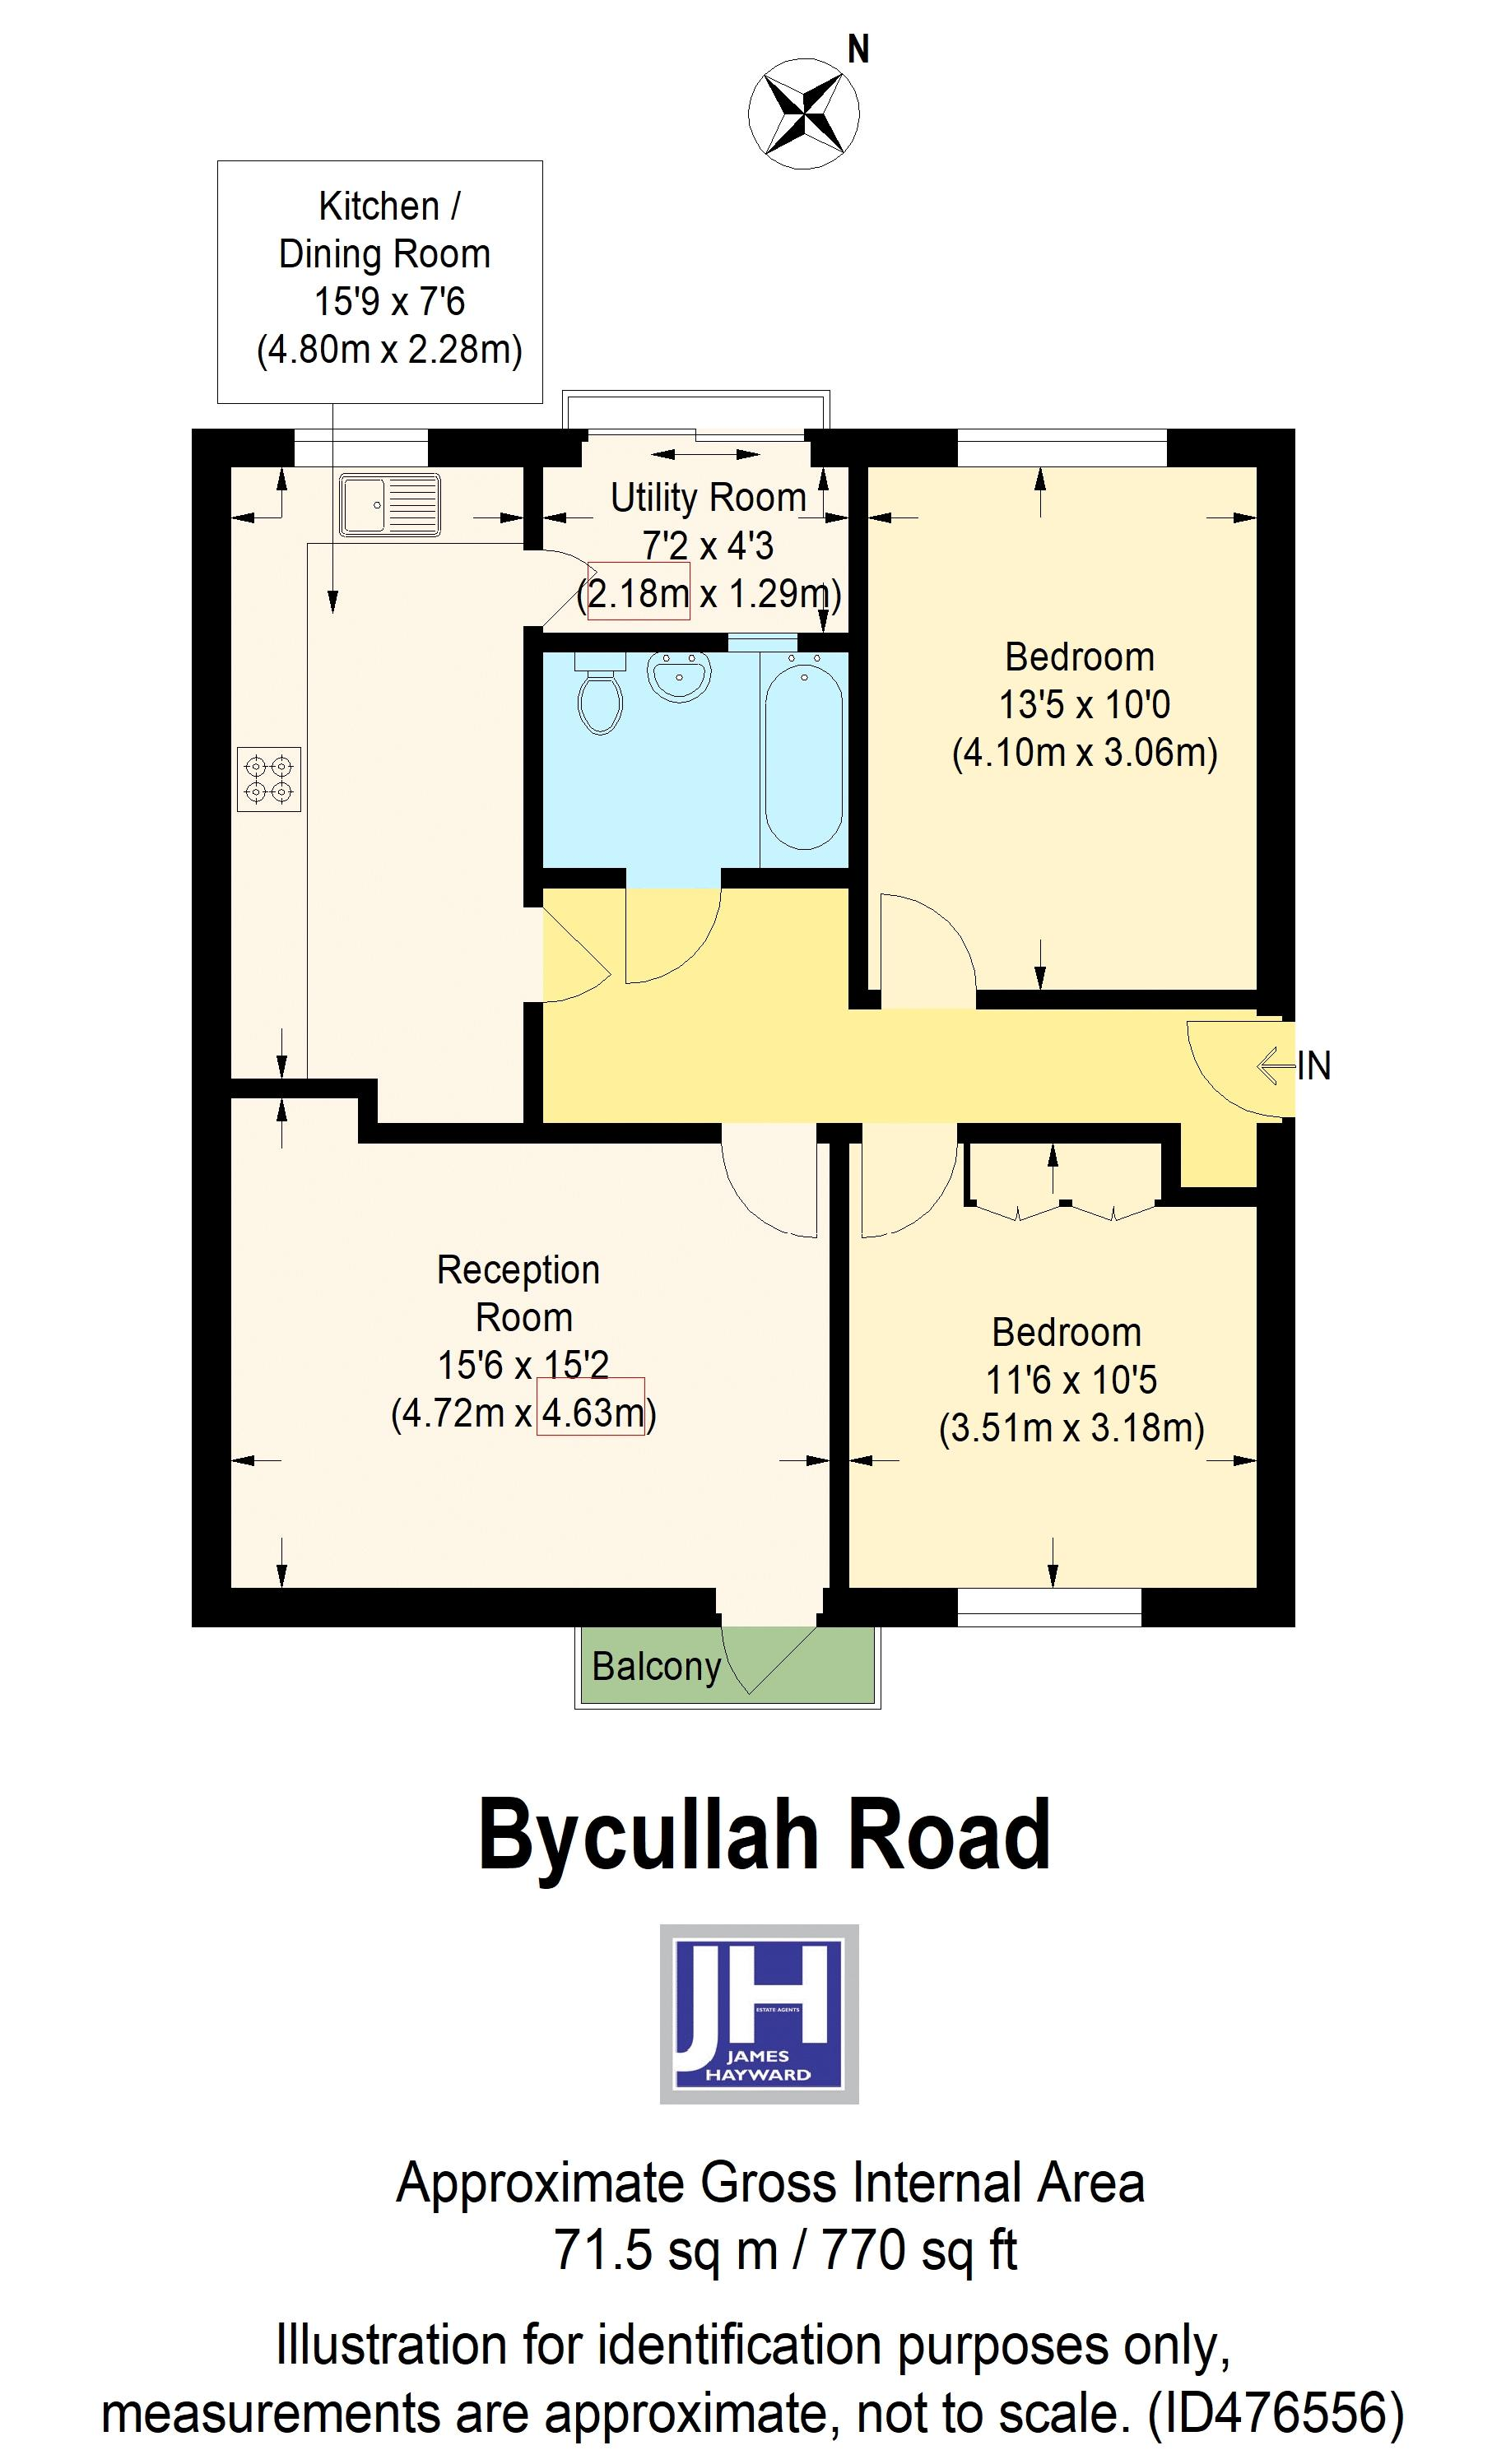 Bycullah Road